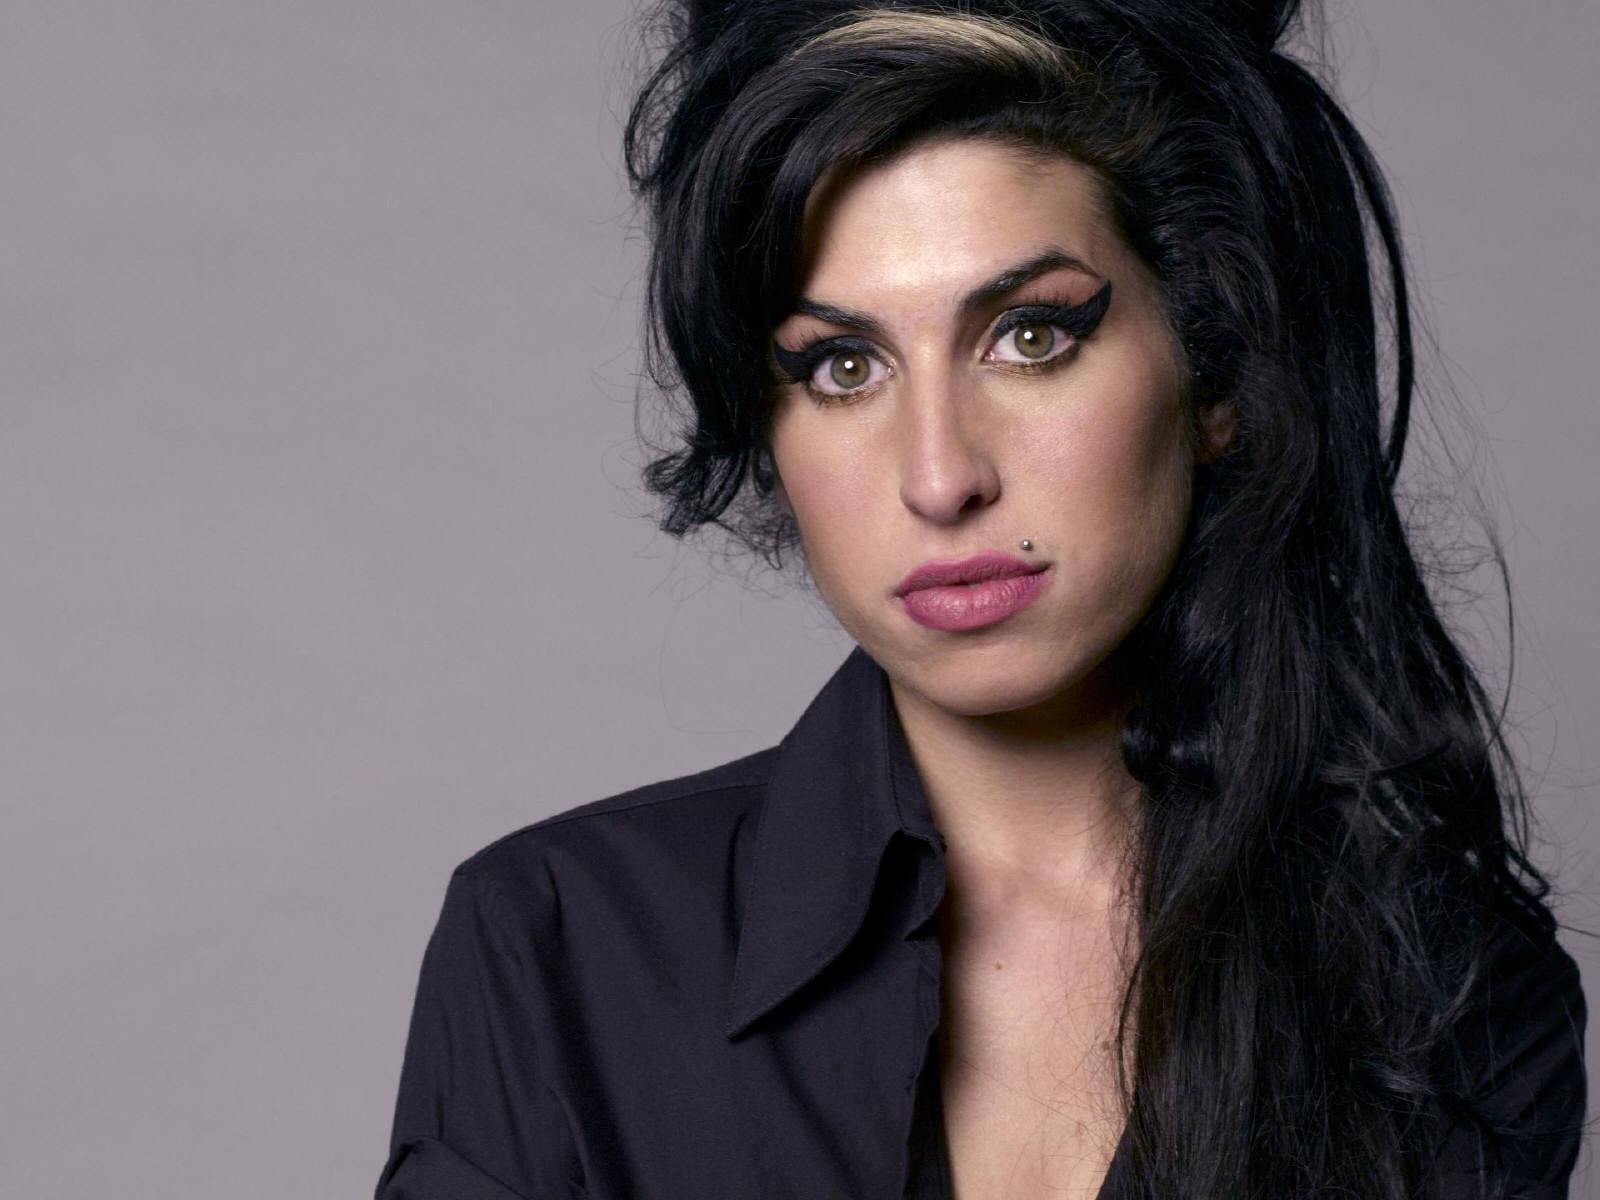 http://2.bp.blogspot.com/-zgL8Mw_2Qnc/T9fT9iHH3wI/AAAAAAAABes/_tlTMue81xc/s1600/Amy+Winehouse.jpg